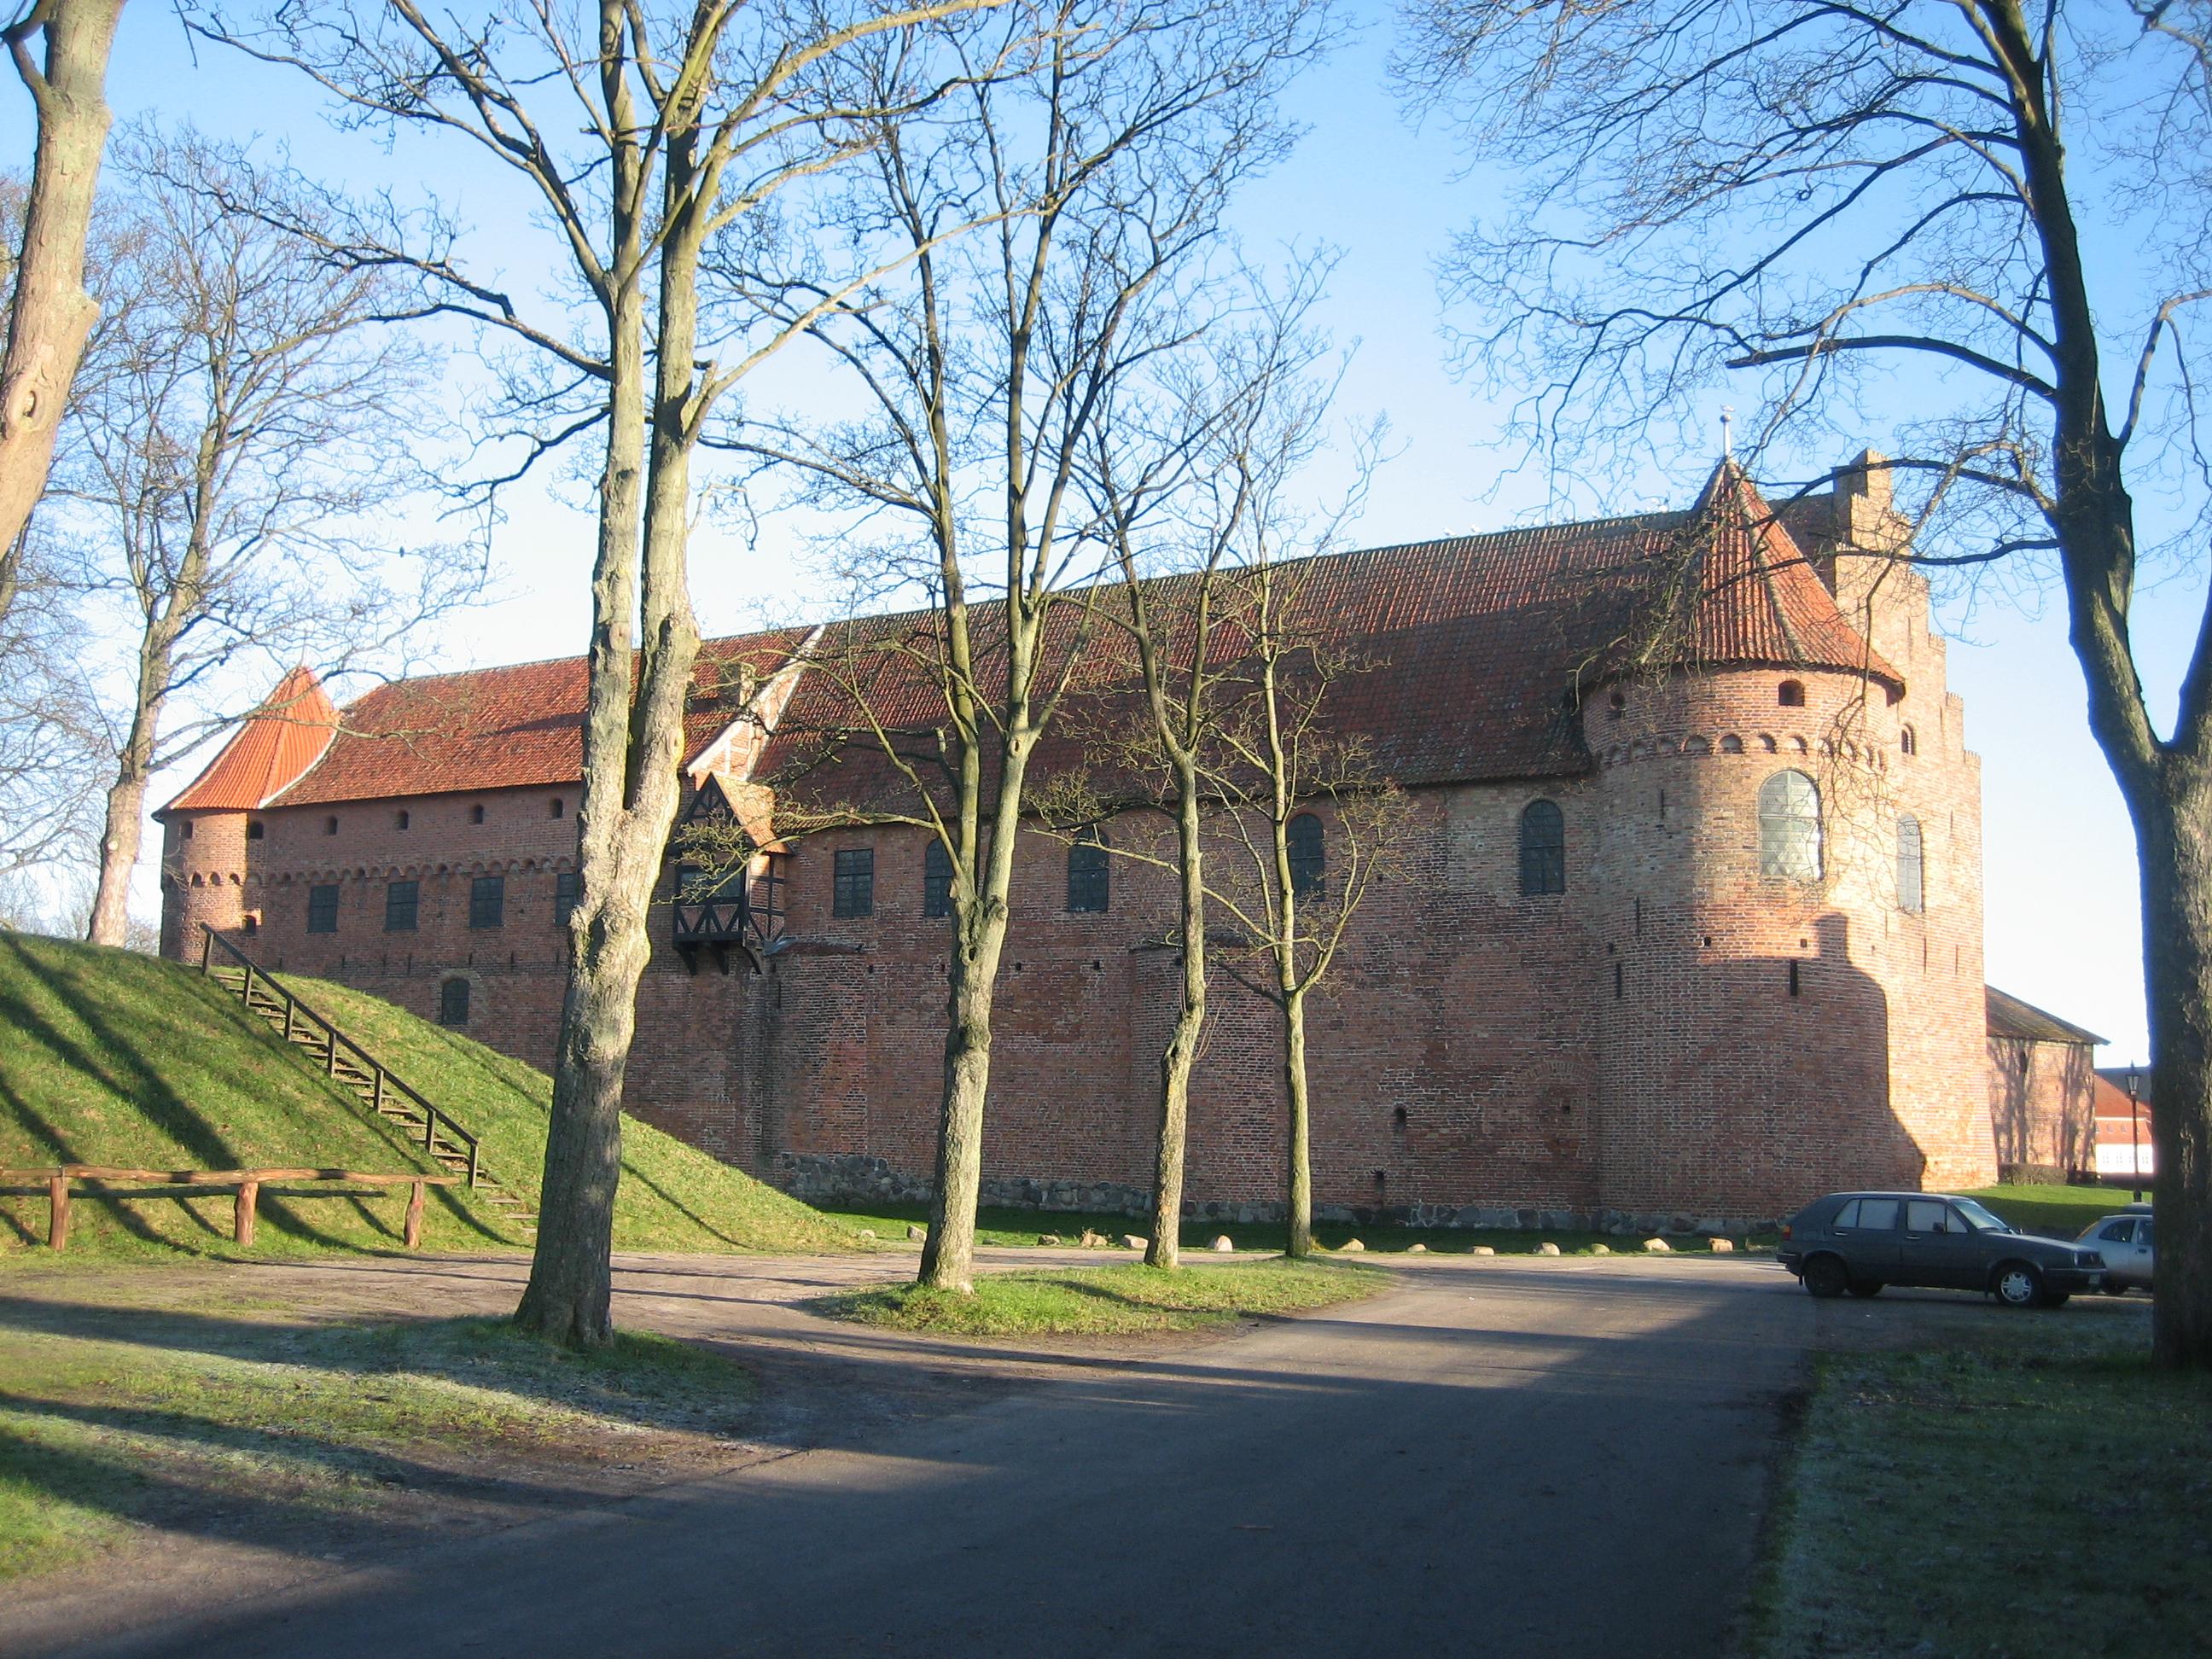 File:Nyborg Castle.jpg - Wikimedia Commons